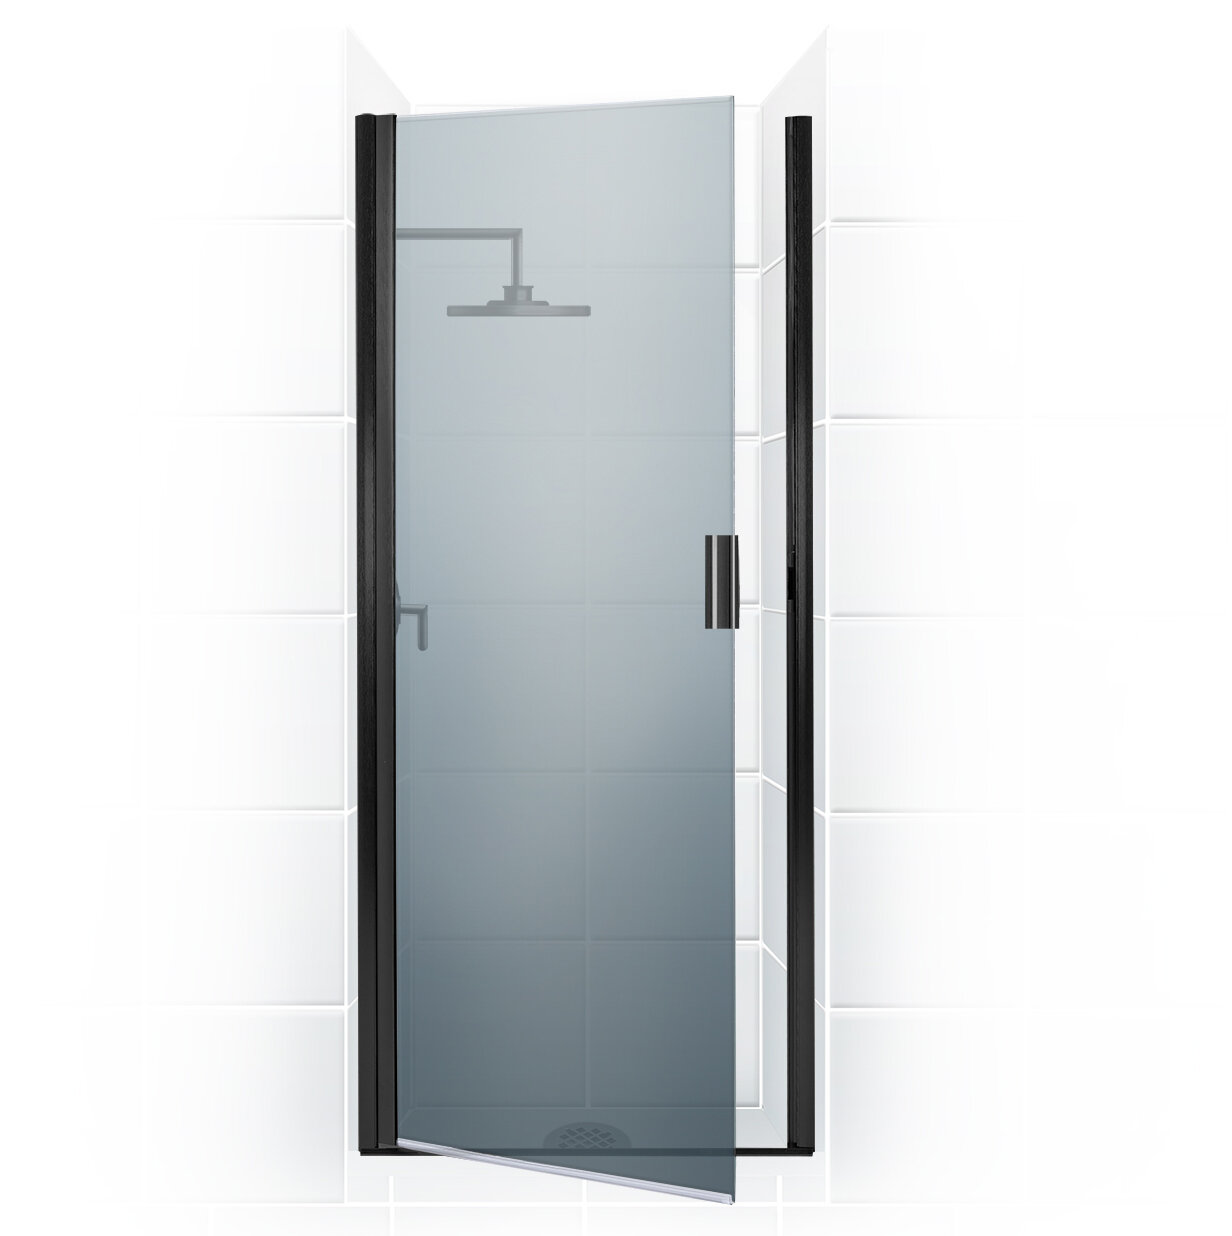 Coastal Industries Paragon Series 32 X 65 Hinged Semi Frameless Shower Door Wayfair